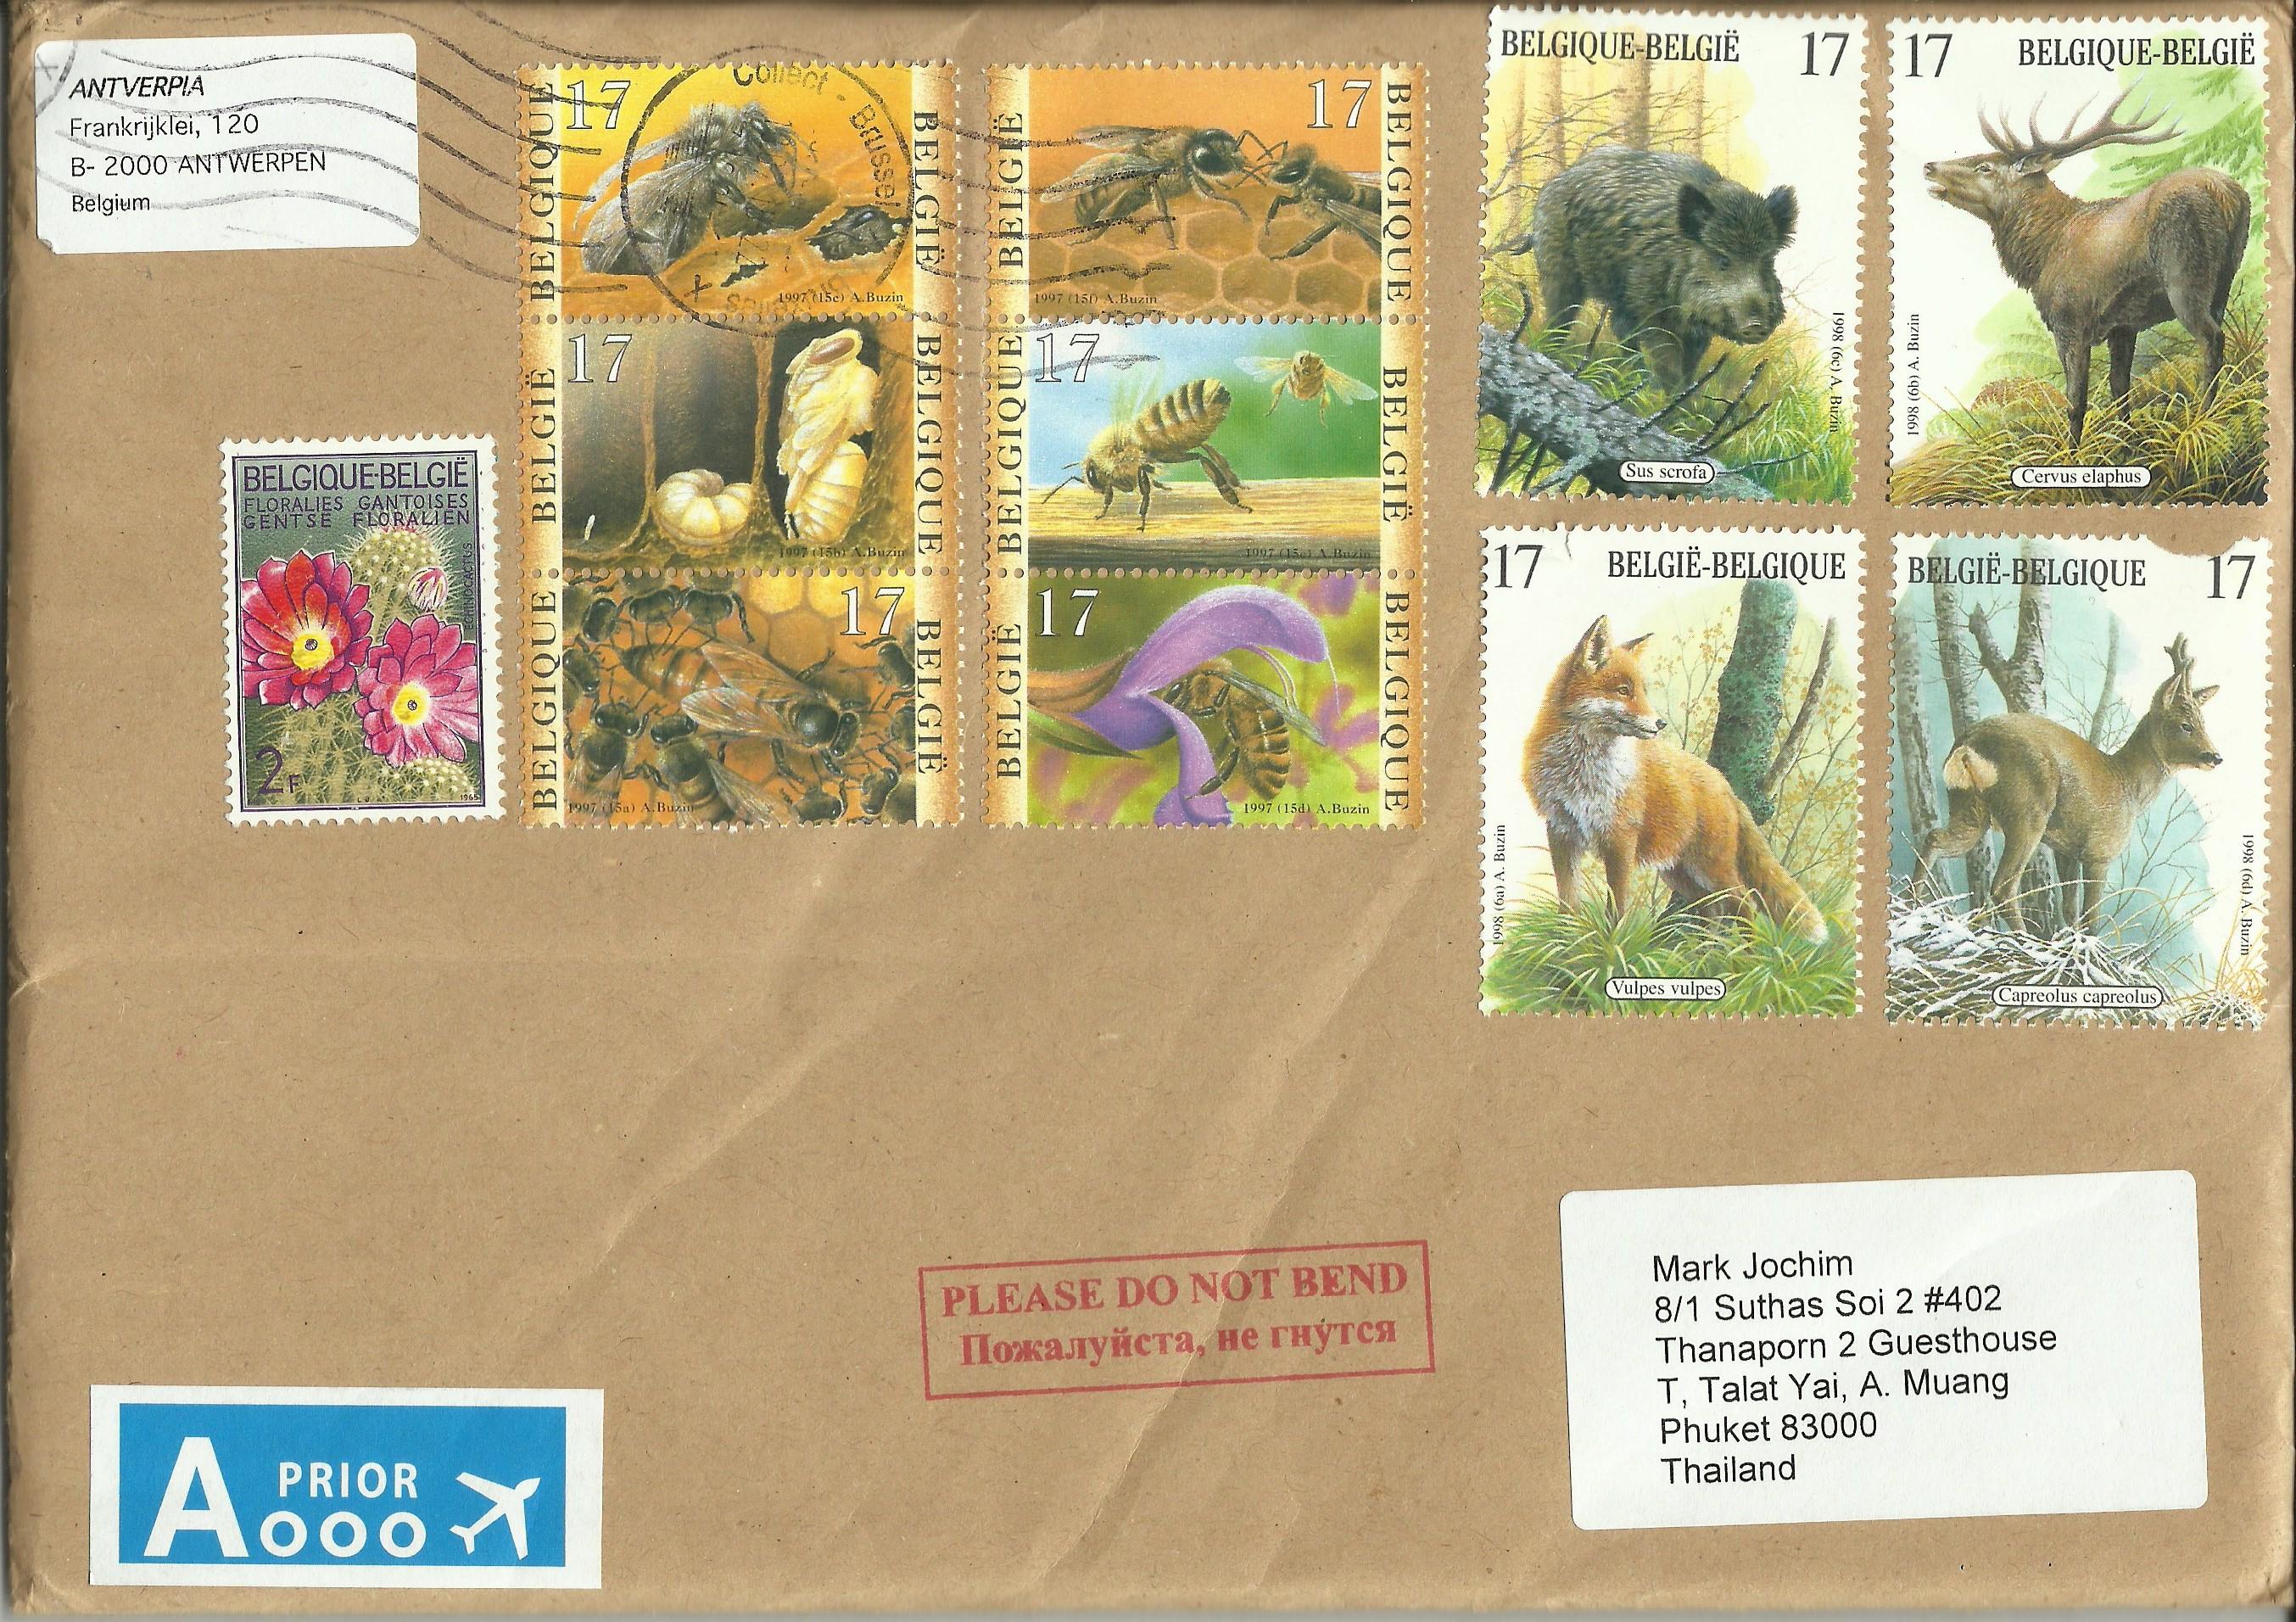 Belgium - Scott #1692-1695 (1998) on philatelic cover